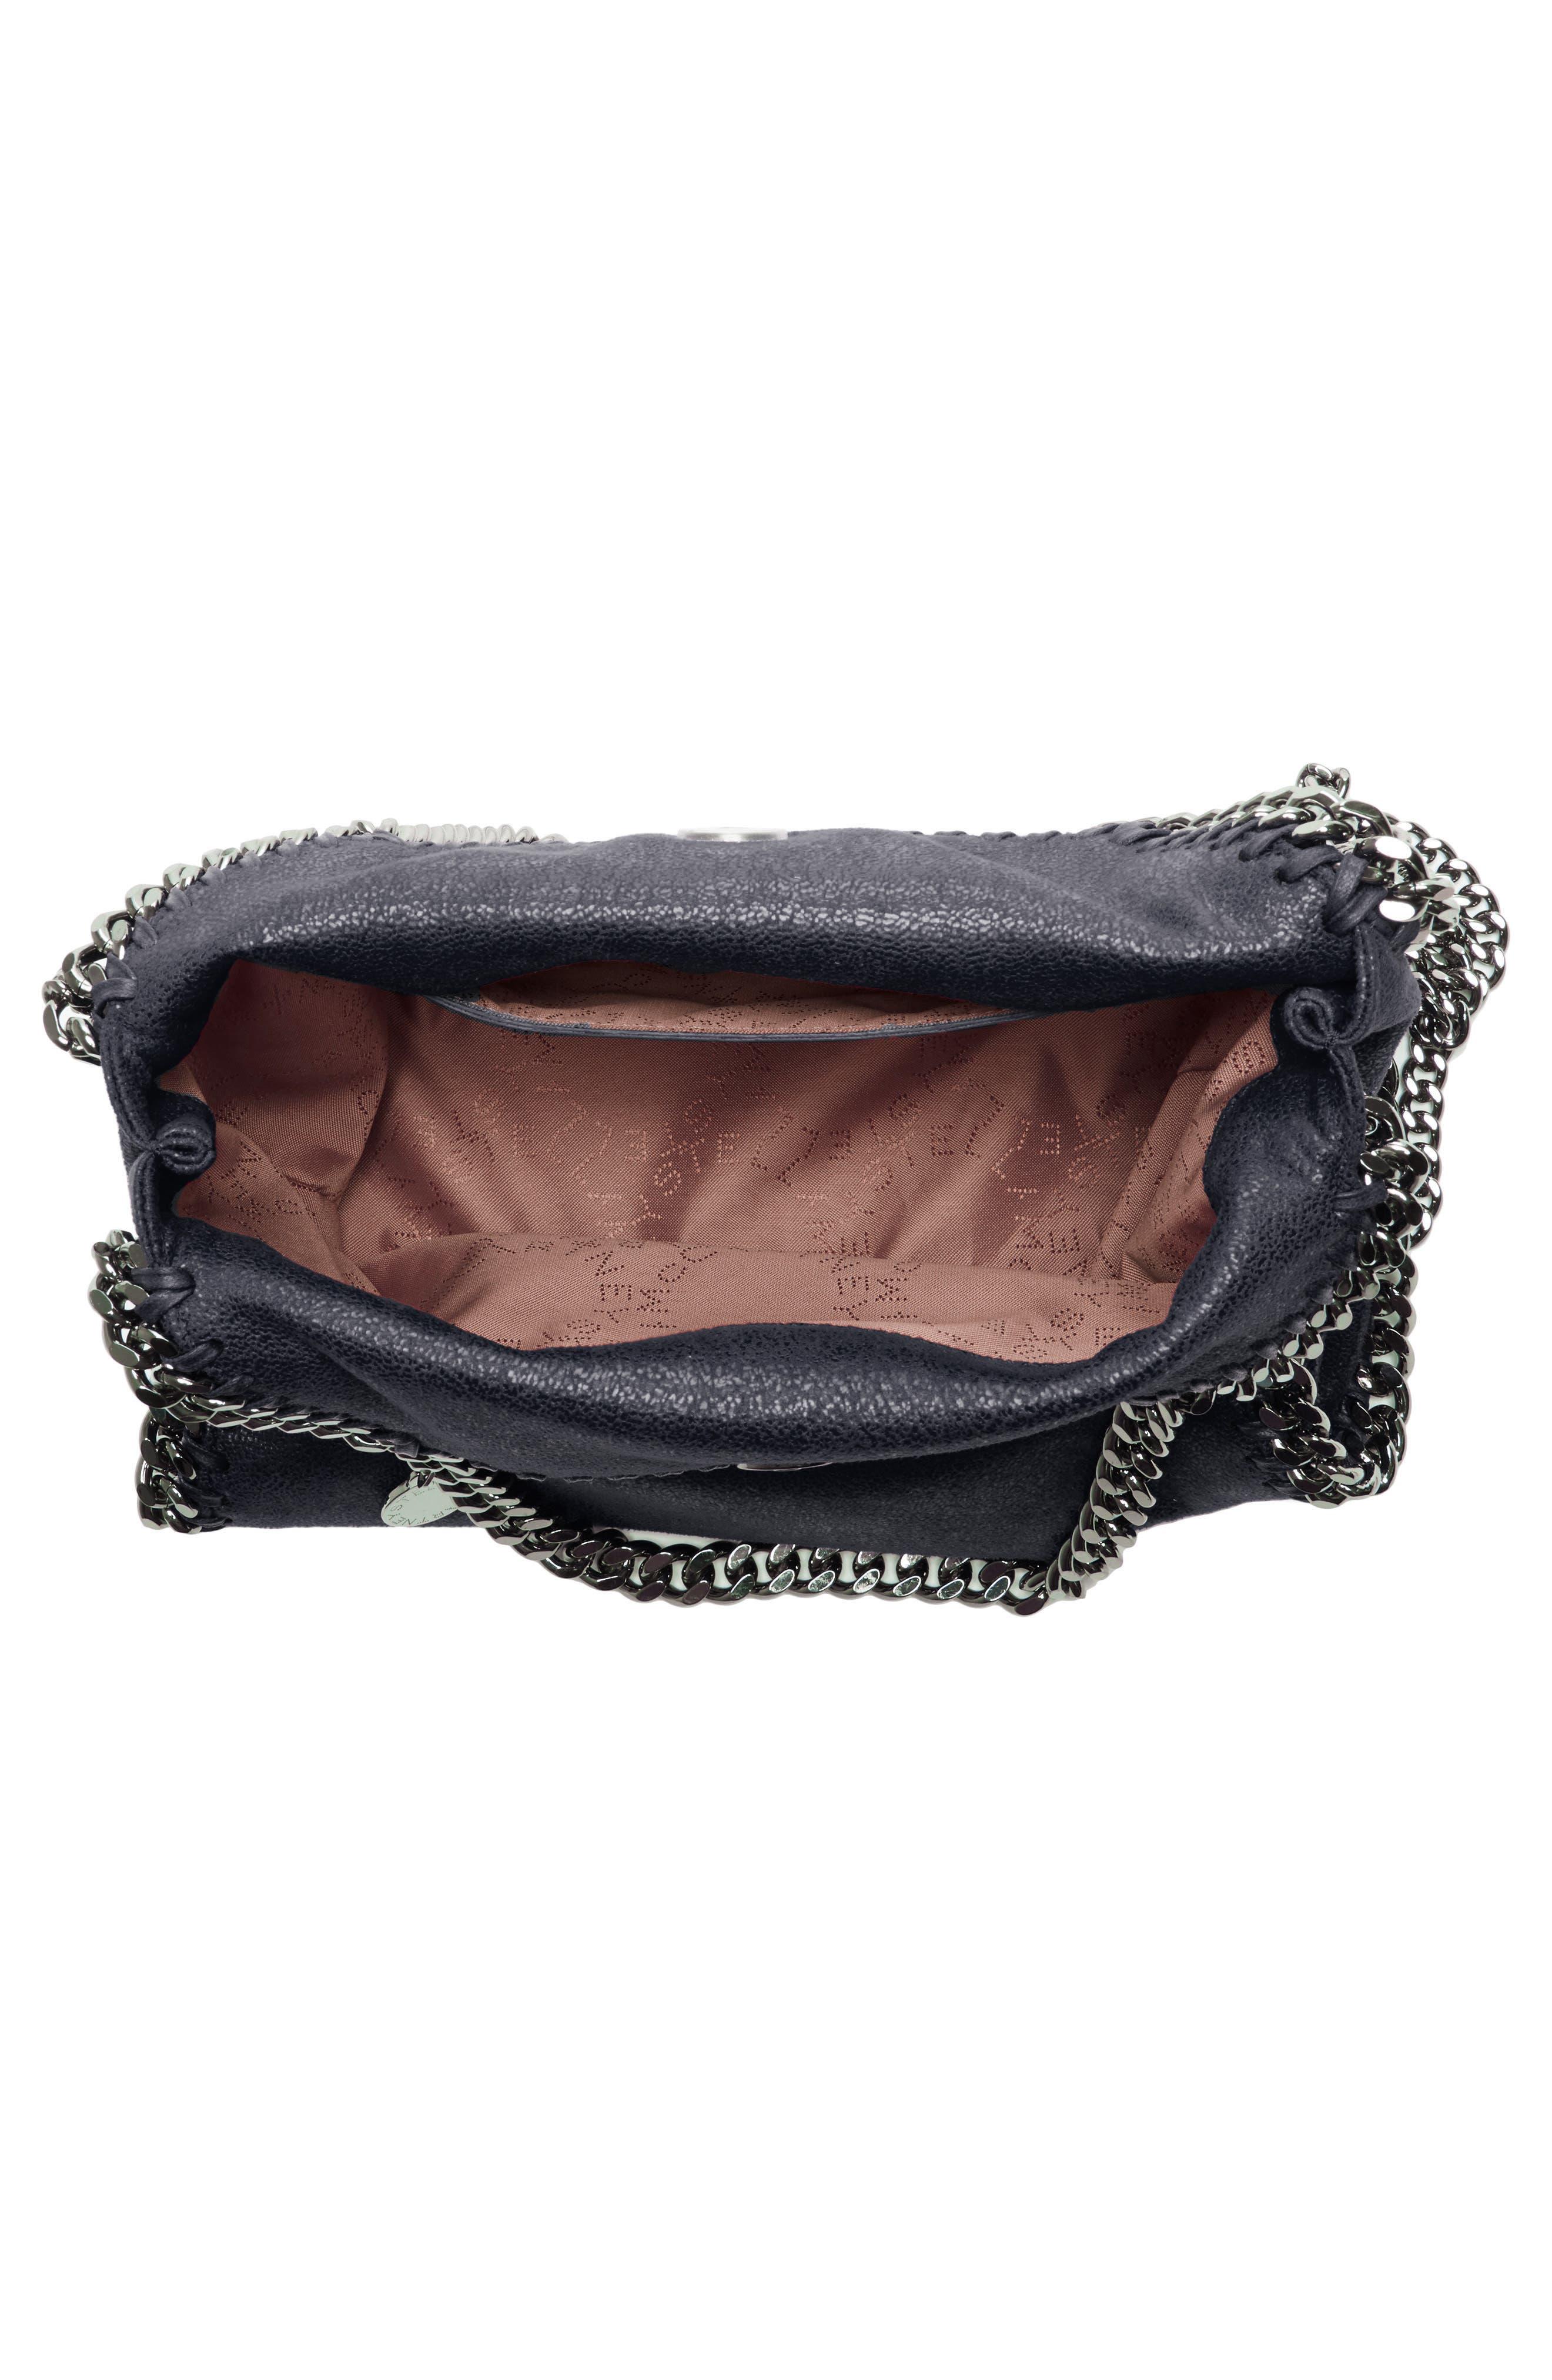 'Mini Falabella - Shaggy Deer' Faux Leather Tote,                             Alternate thumbnail 2, color,                             BLACK W/ SILVER